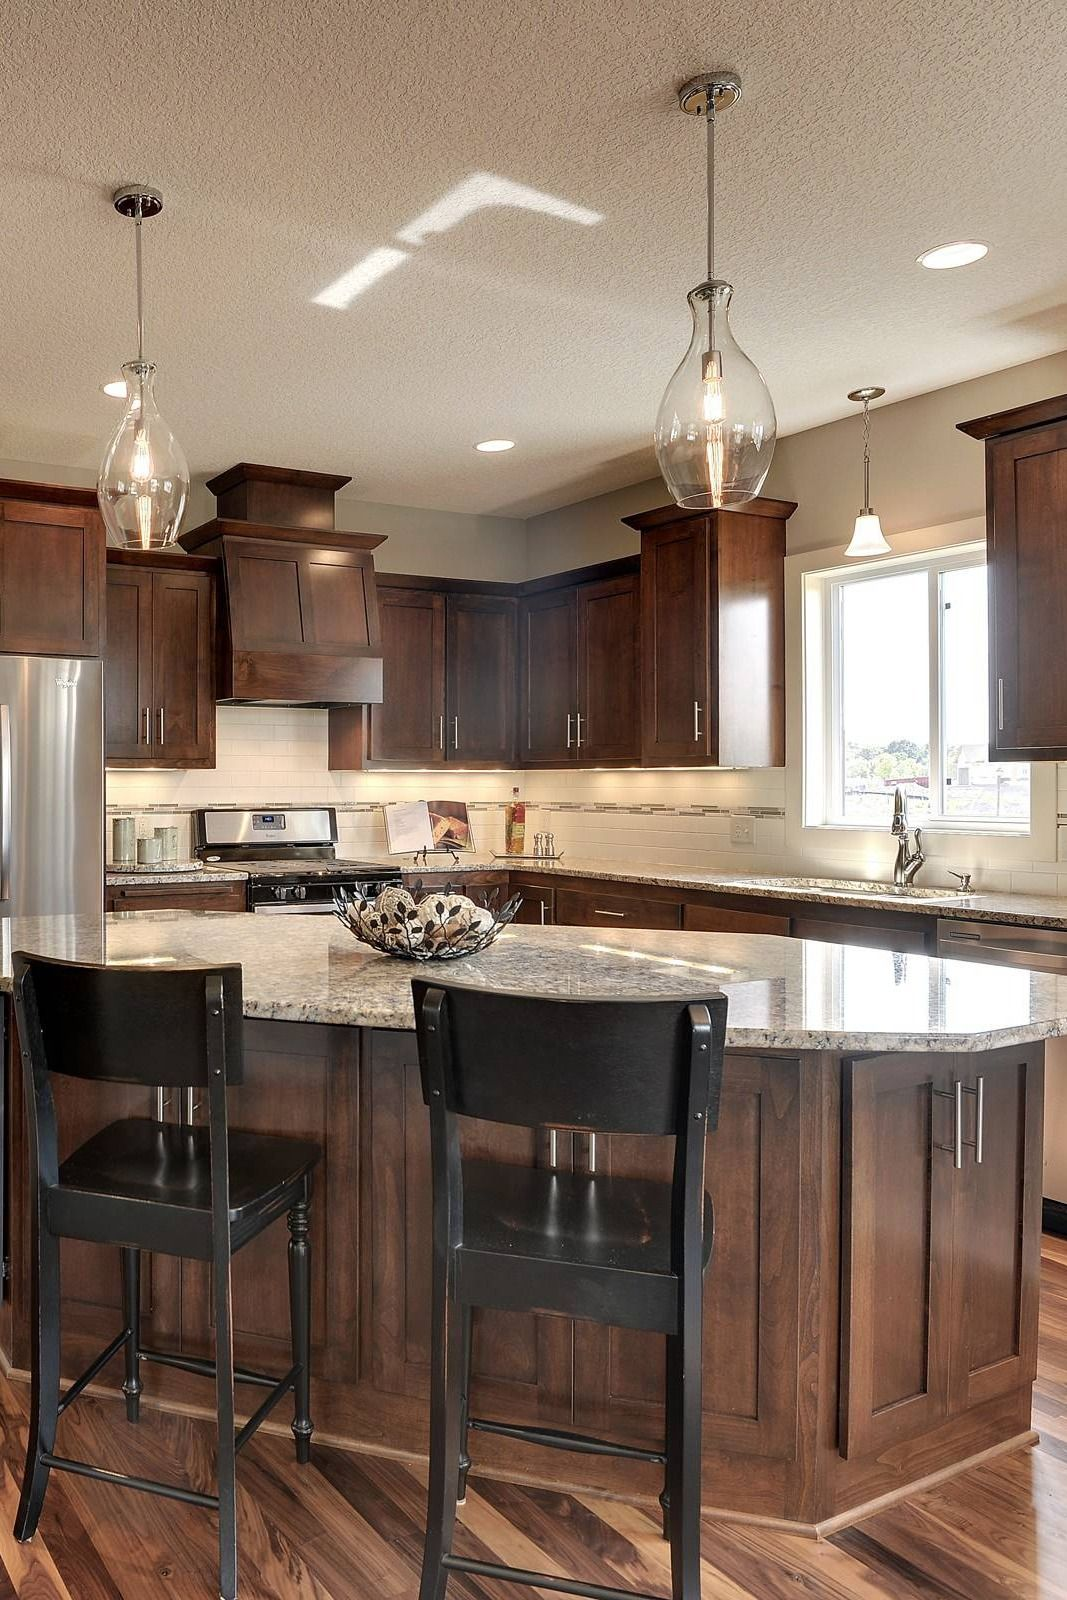 Dark Cabinets With White Granite Countertops